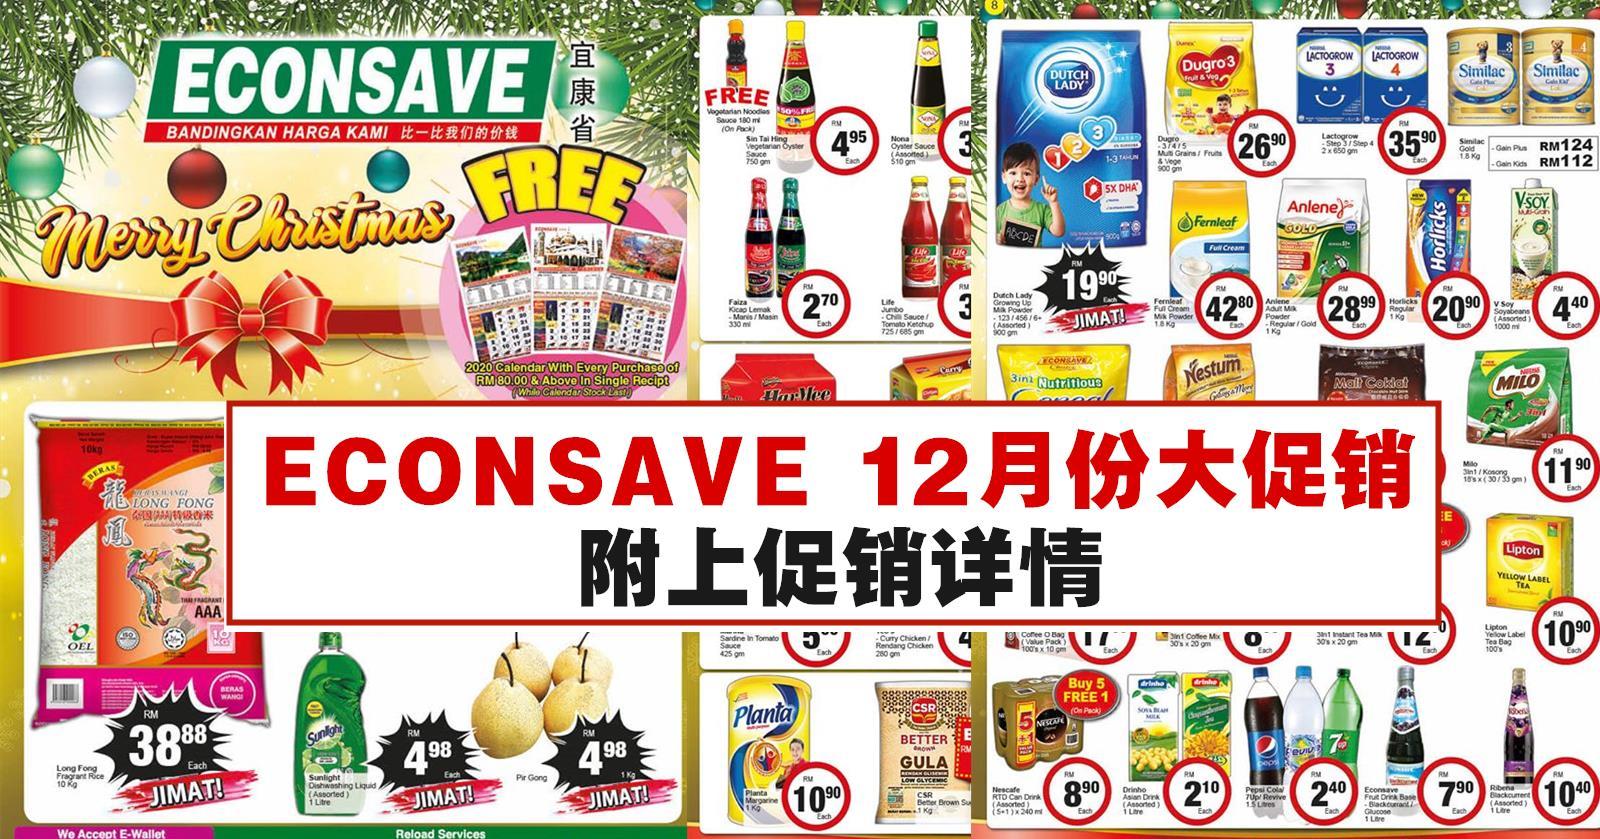 ECONSAVE 12月份大促销